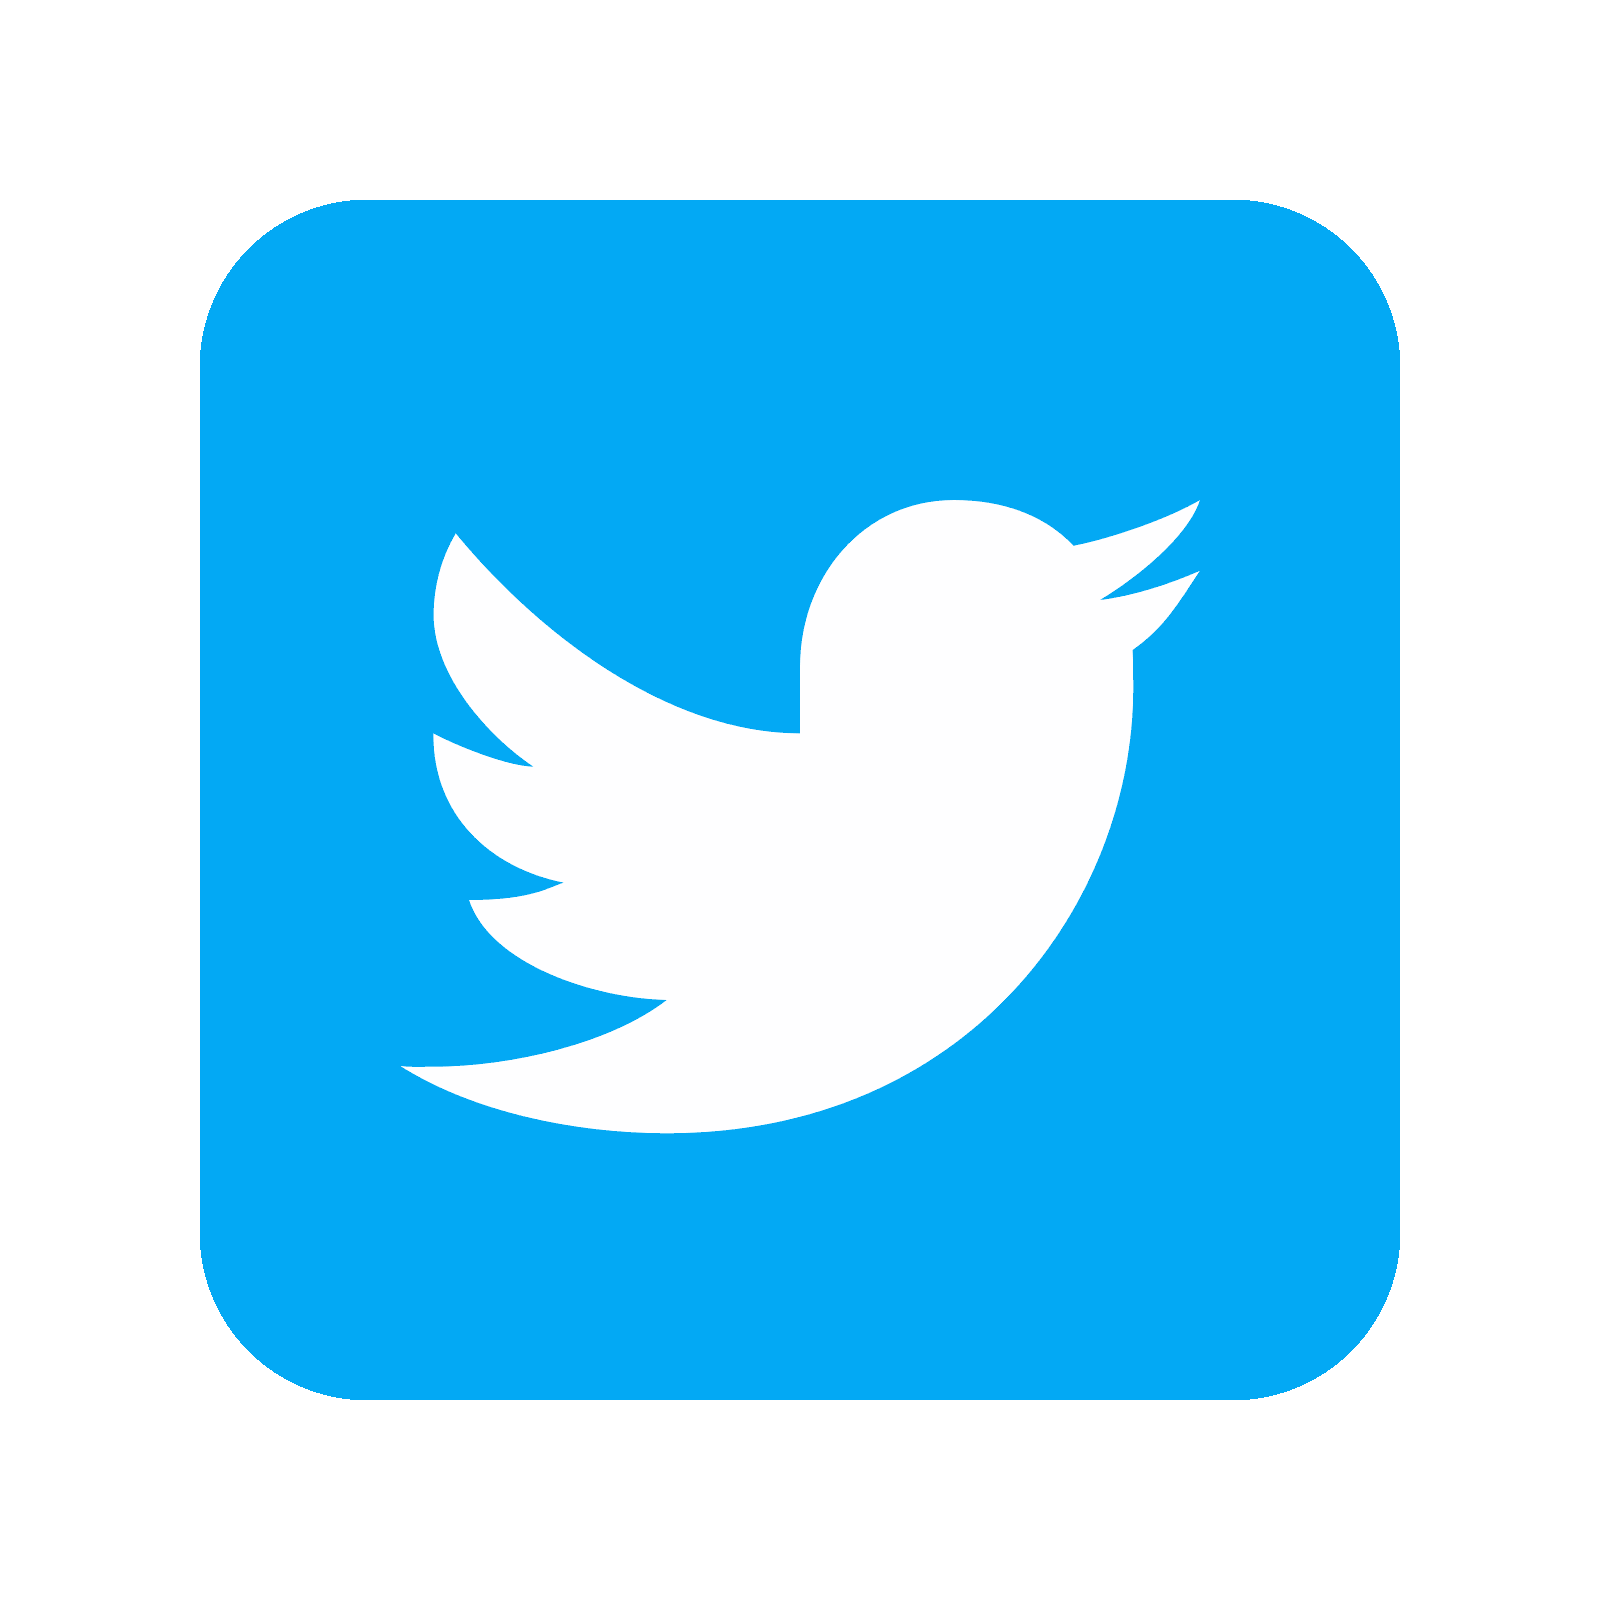 Twitter Cami De Mar